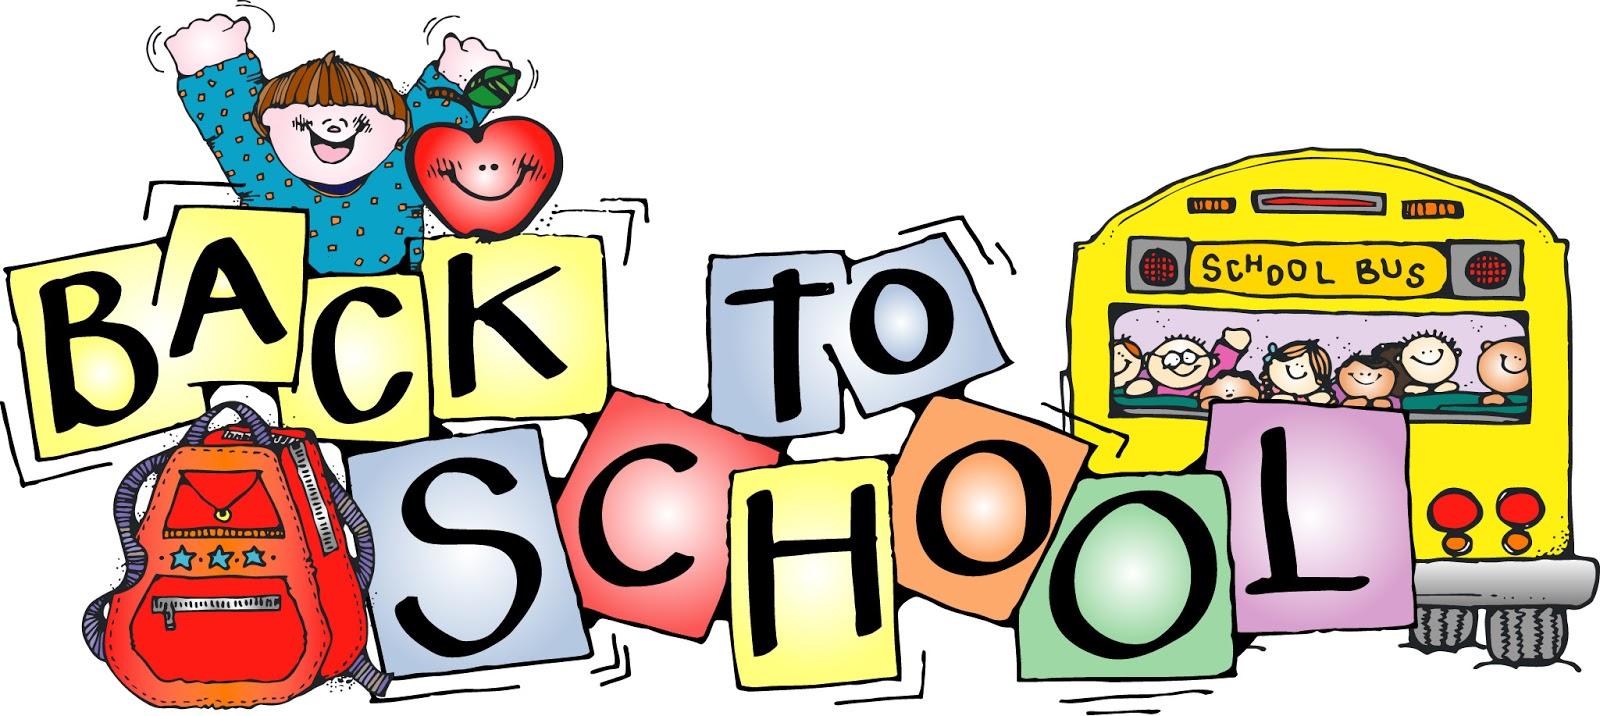 back to school clipart-back to school clipart-18